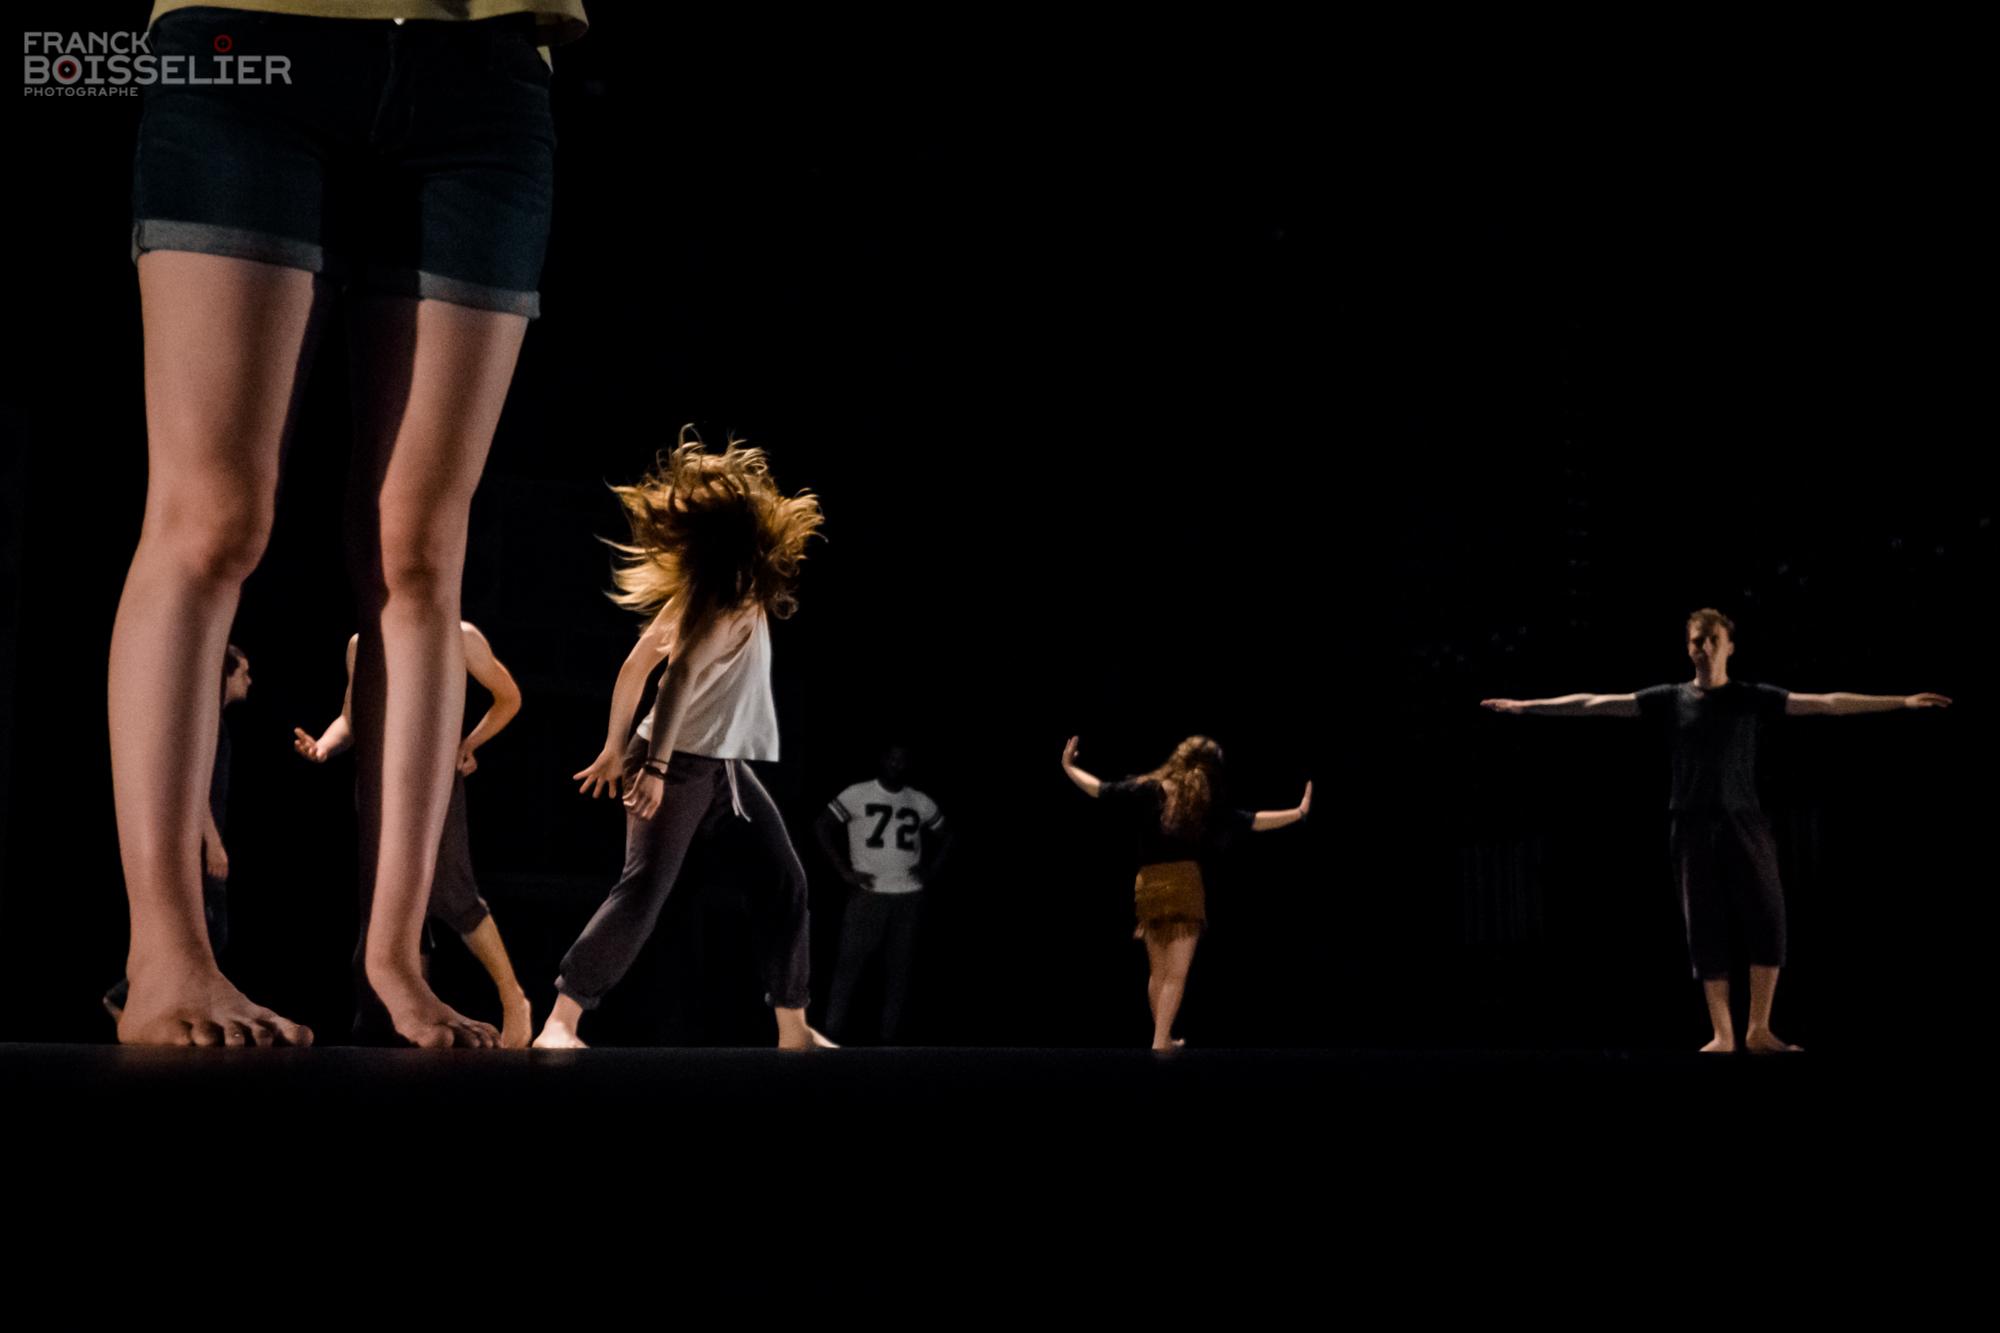 Franck Boisselier Photographe Spectacle